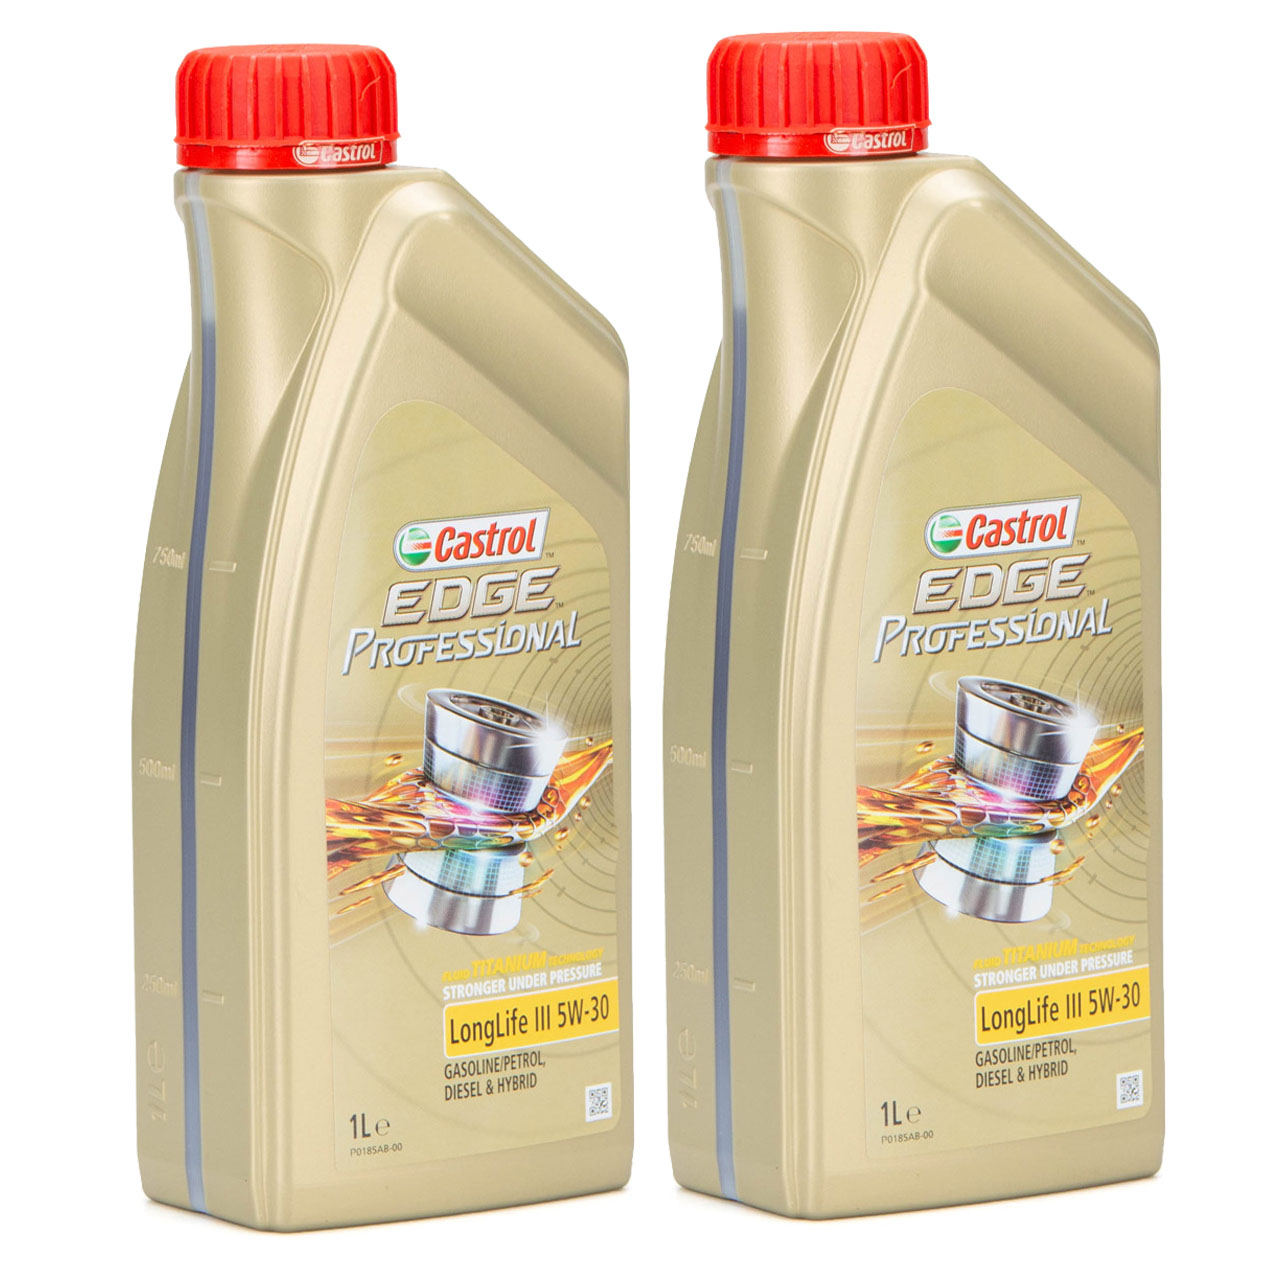 CASTROL EDGE Professional Motoröl Öl TITANIUM LongLife III 5W-30 5W30 - 2 Liter